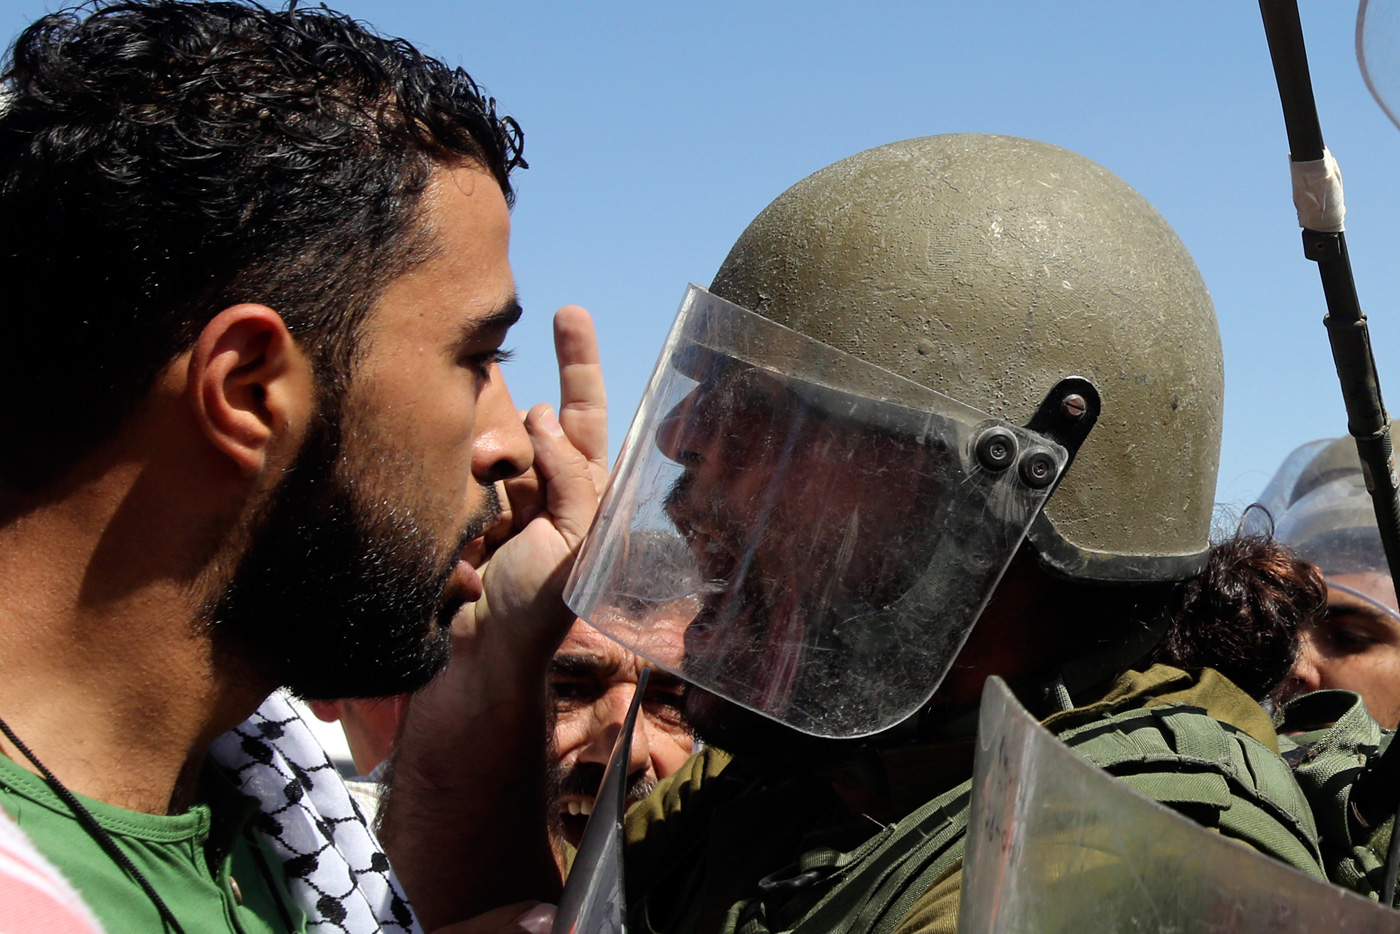 Москва по-новому взглянула на палестино-израильский конфликт